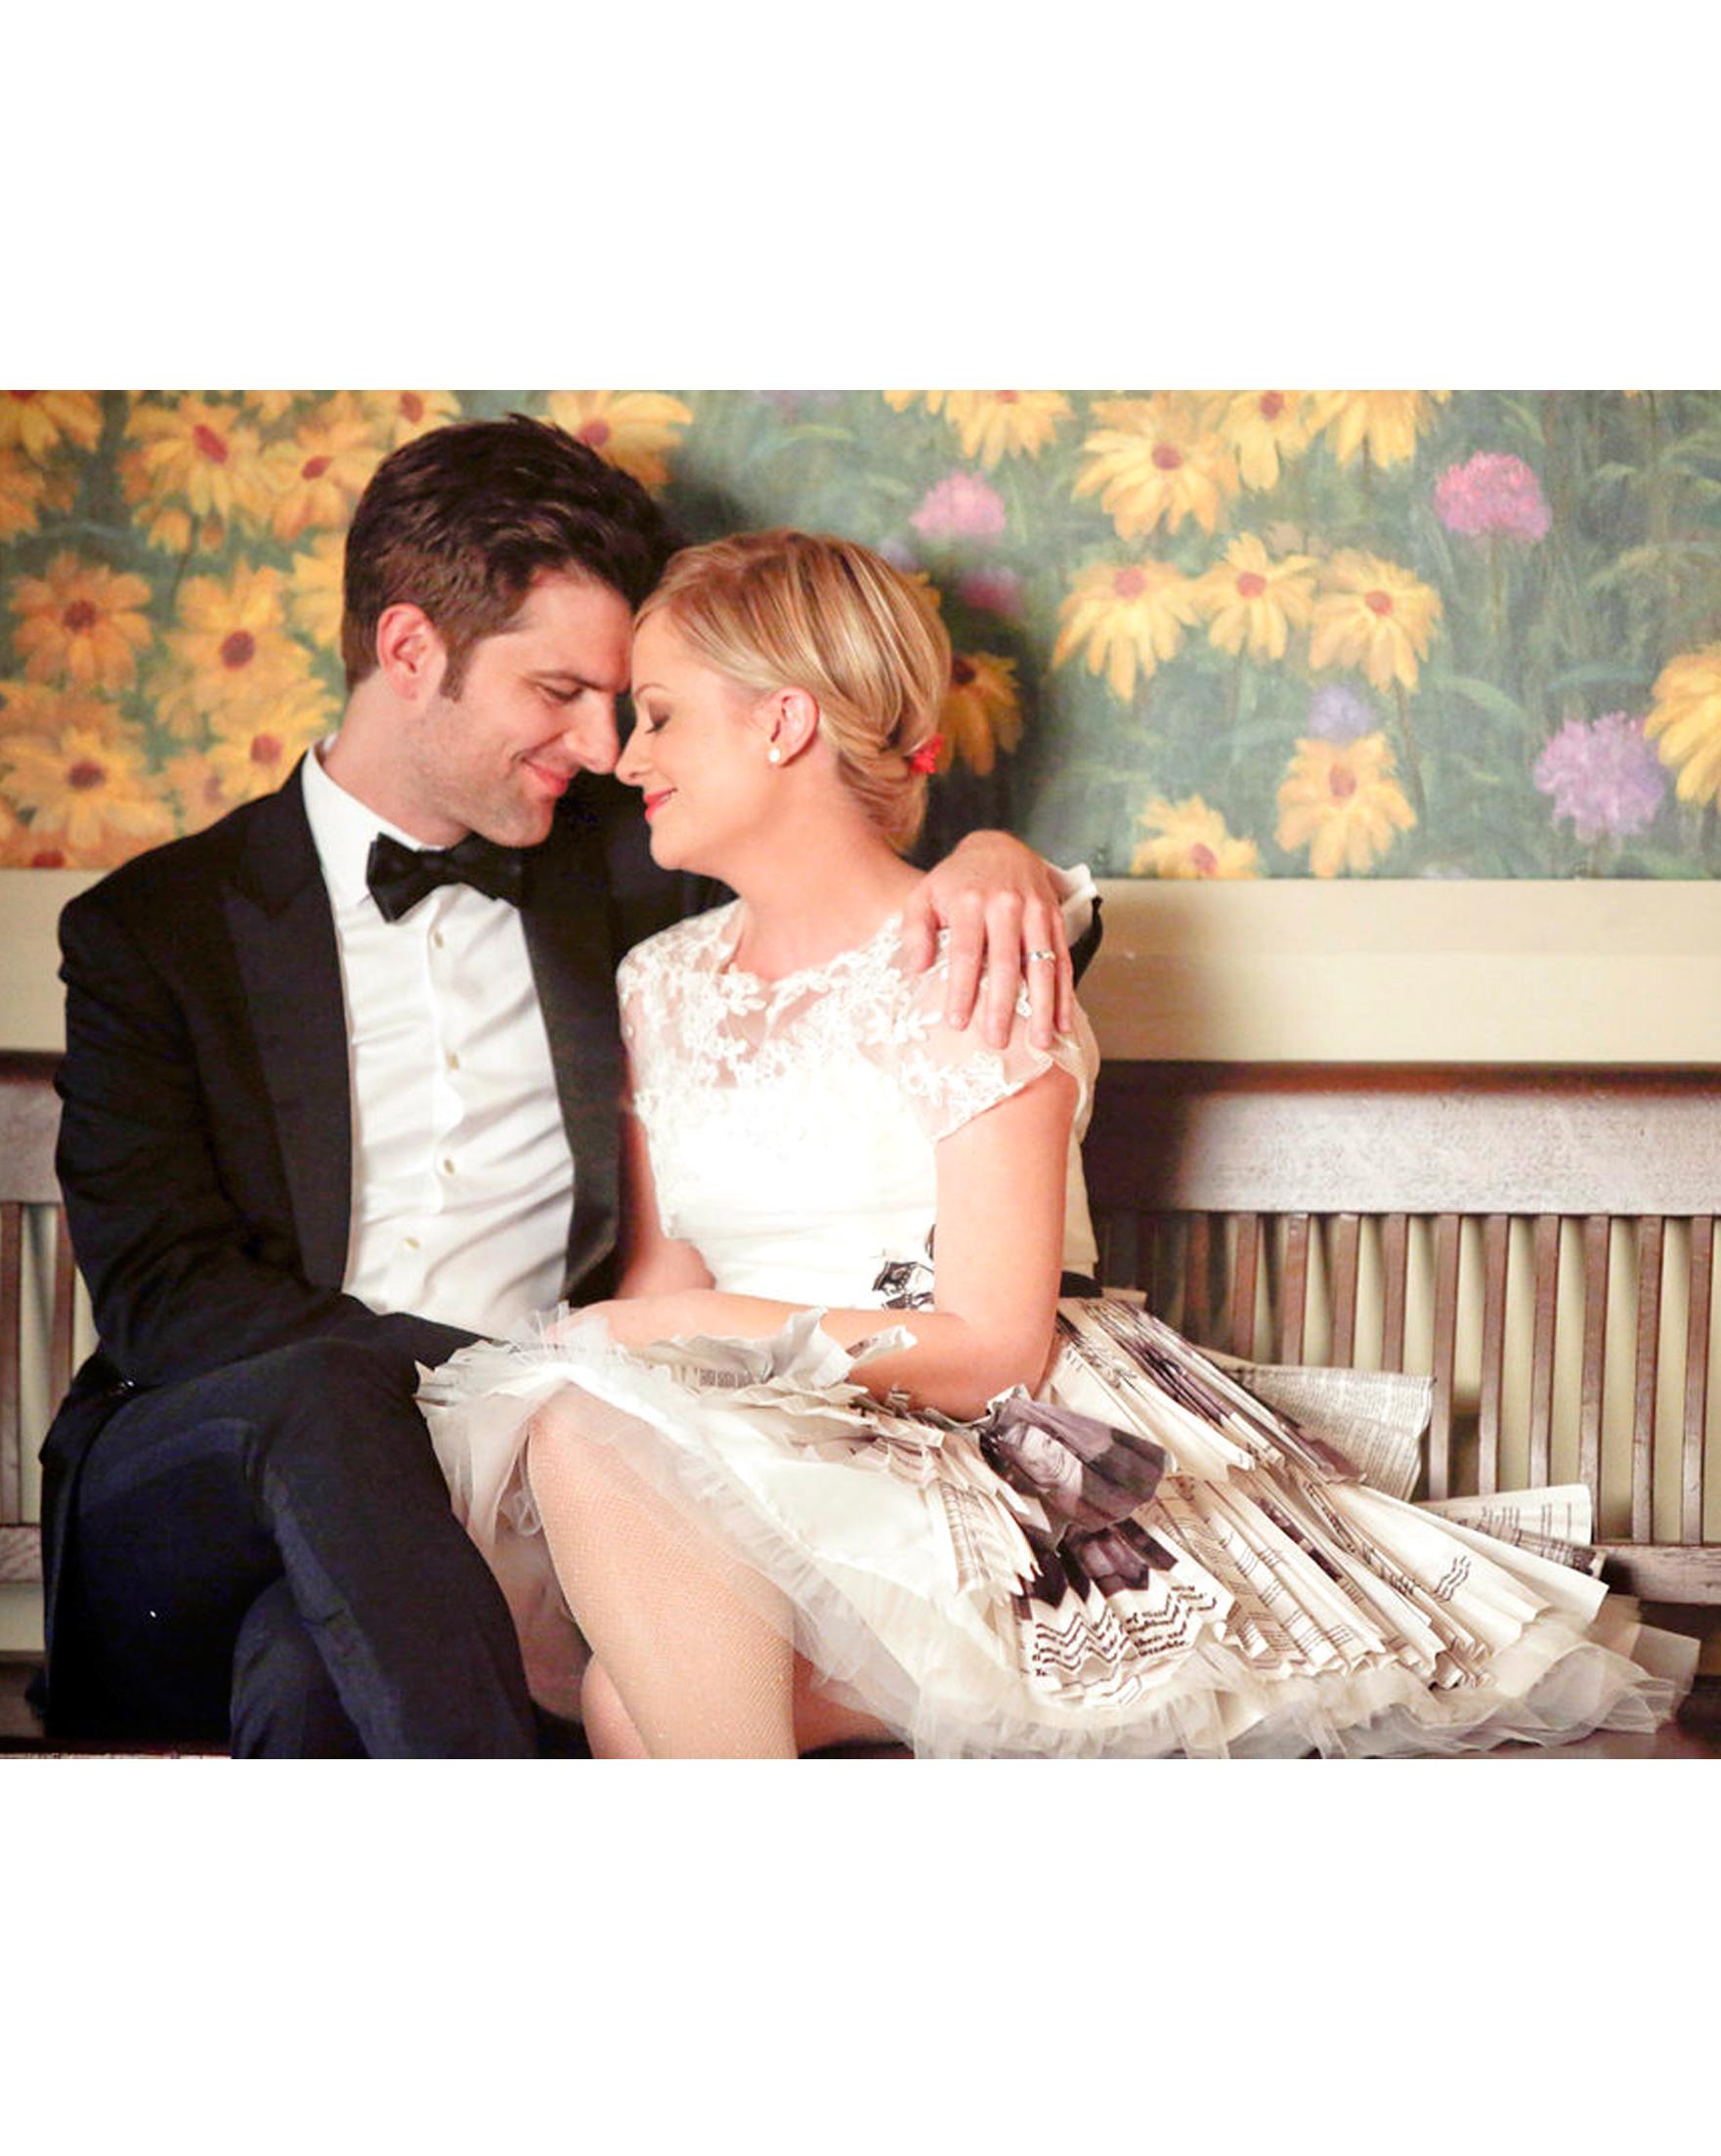 secrets-to-happy-marriage-parks-and-rec-leslie-ben-wedding-1015.jpg